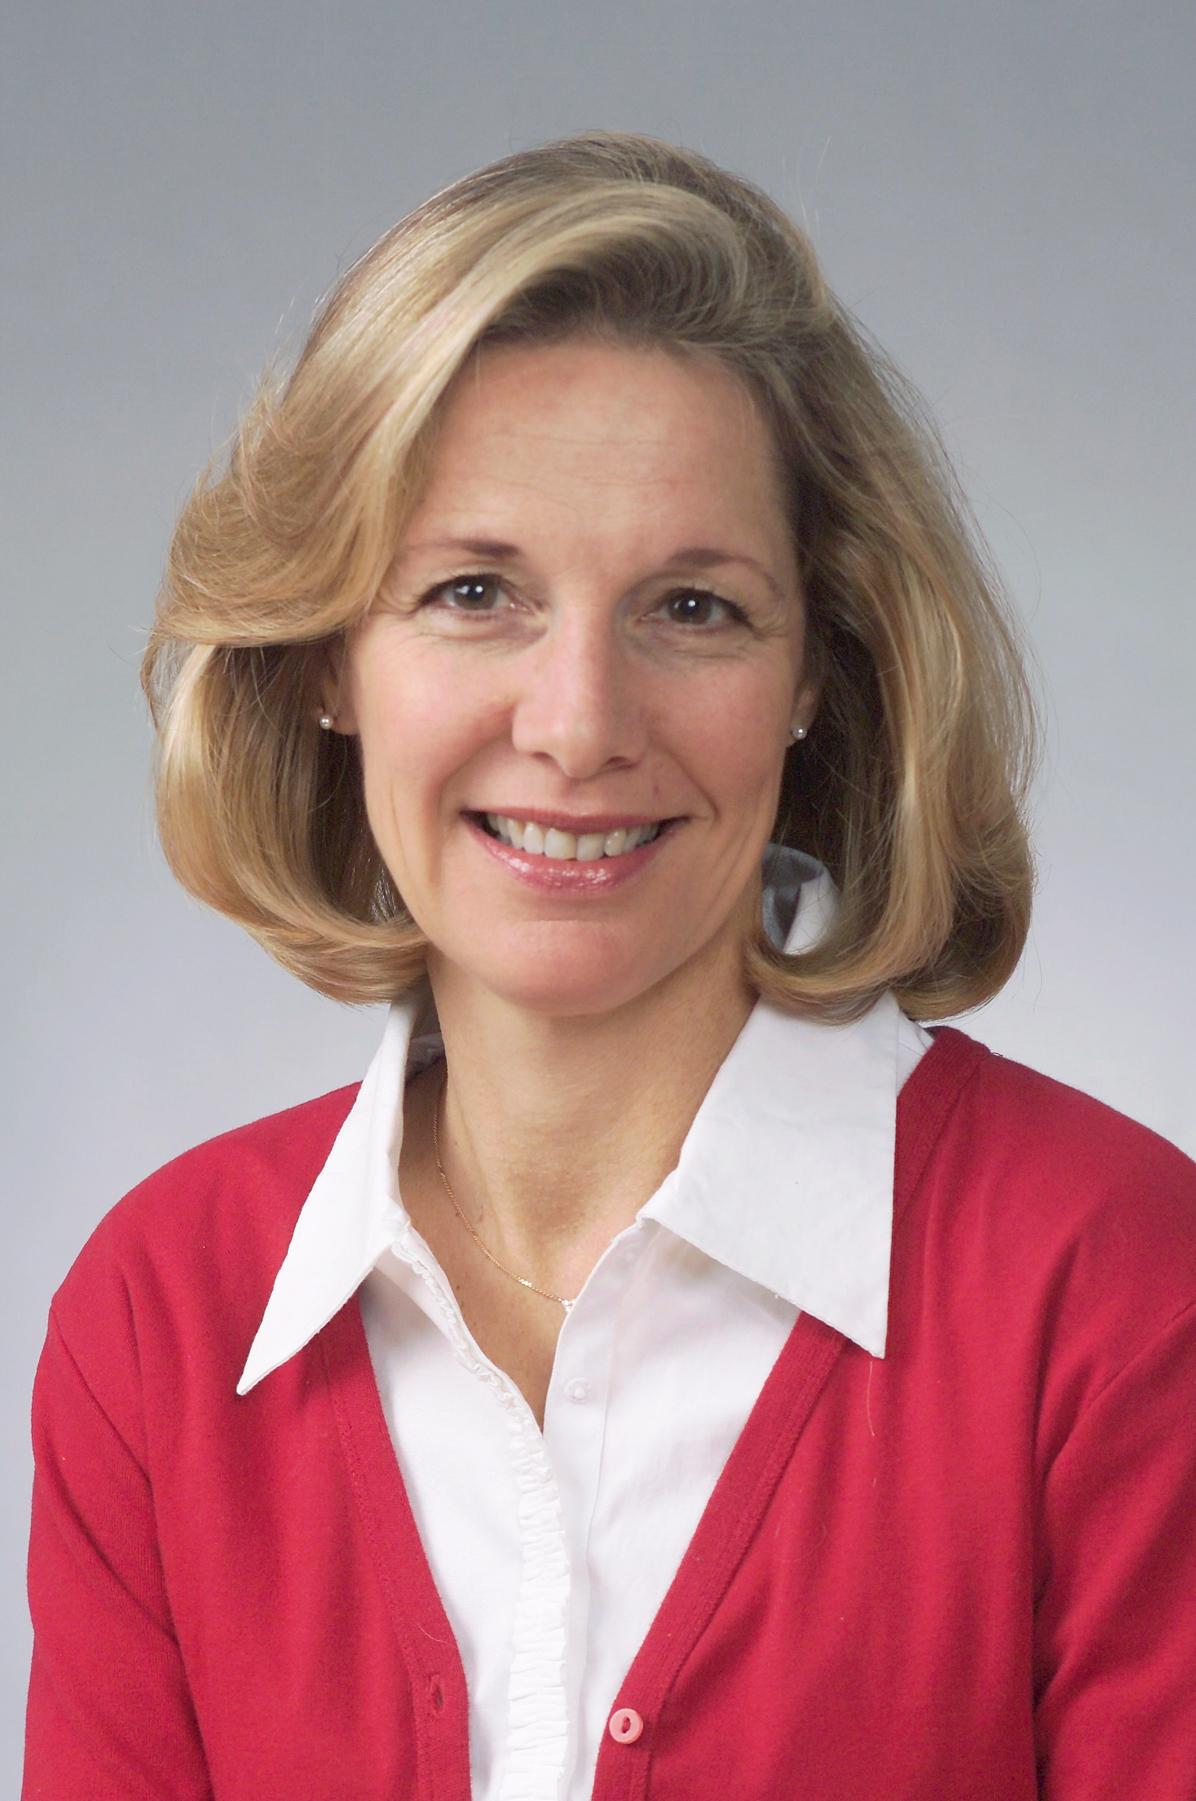 Catherine Tamaya